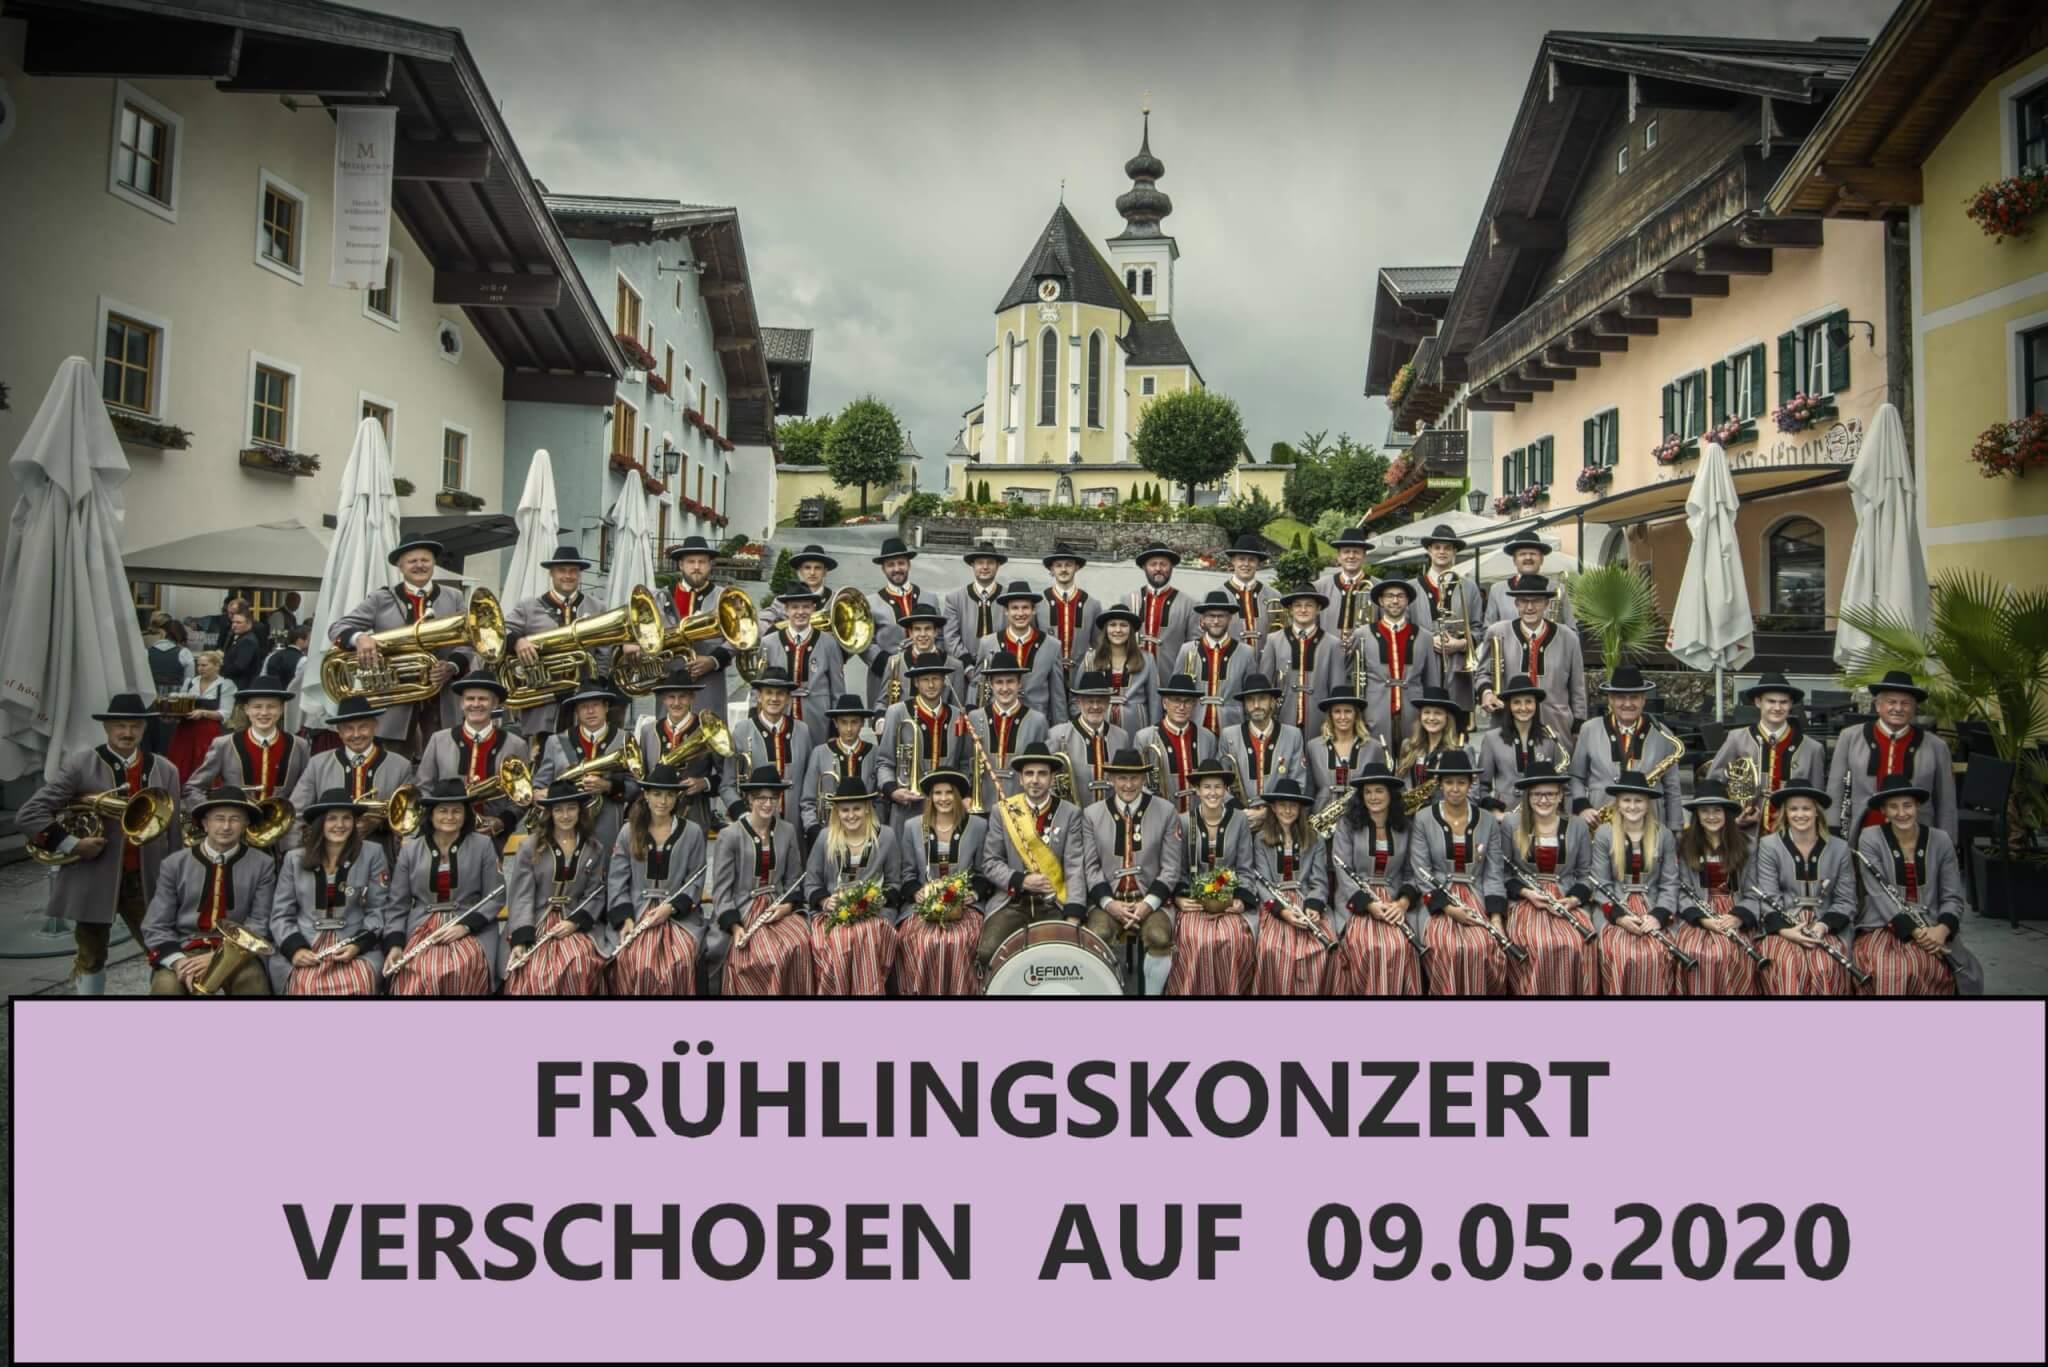 VERSCHOBEN auf 09.05.2020!  Frühlingskonzert der Trachtenmusikkapelle St. Veit